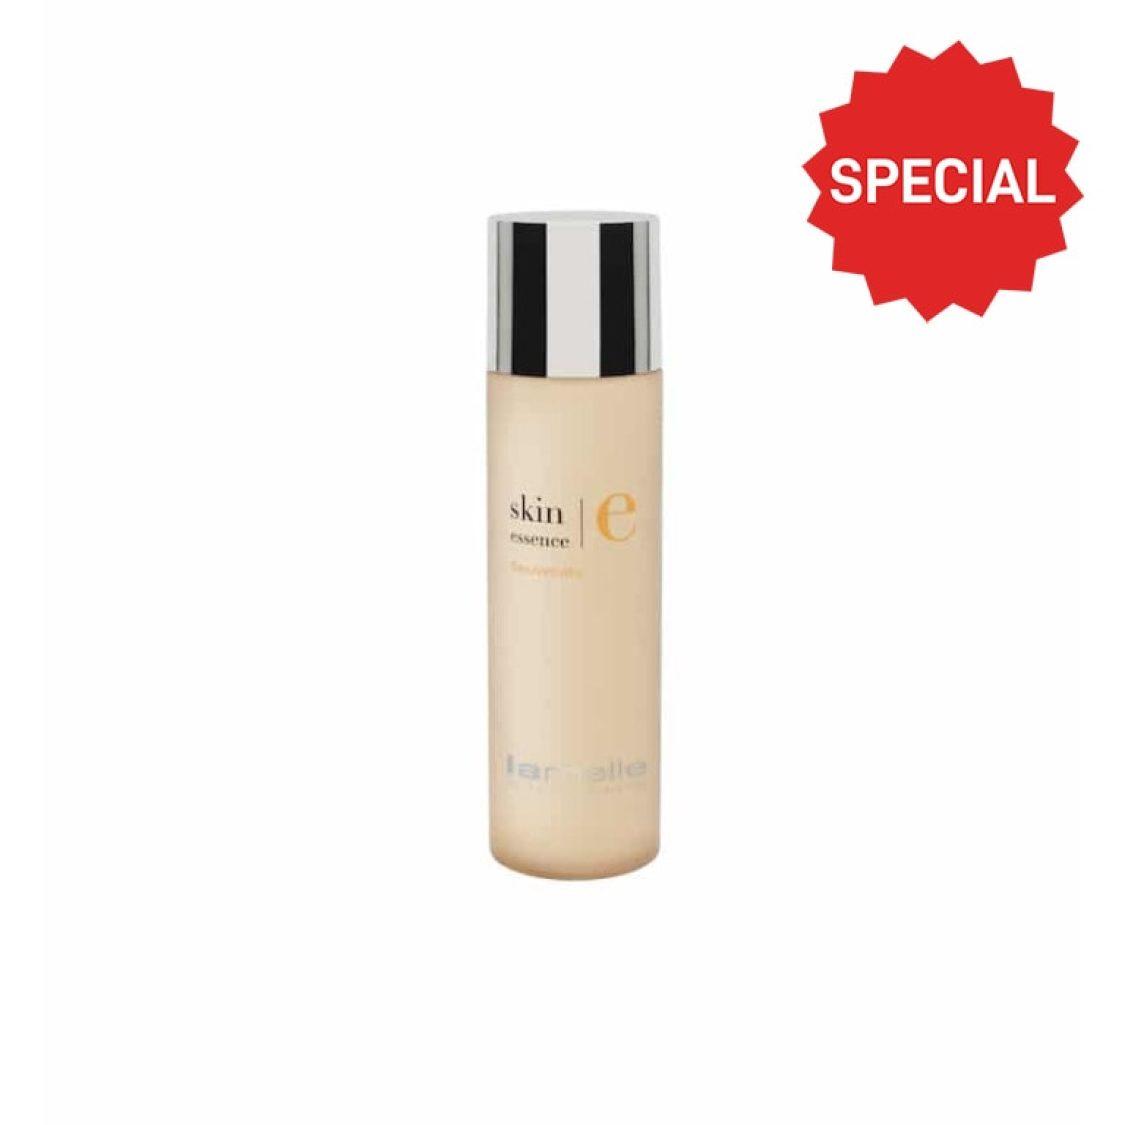 Lamelle - Skin Essence Rejuvenate 150ml